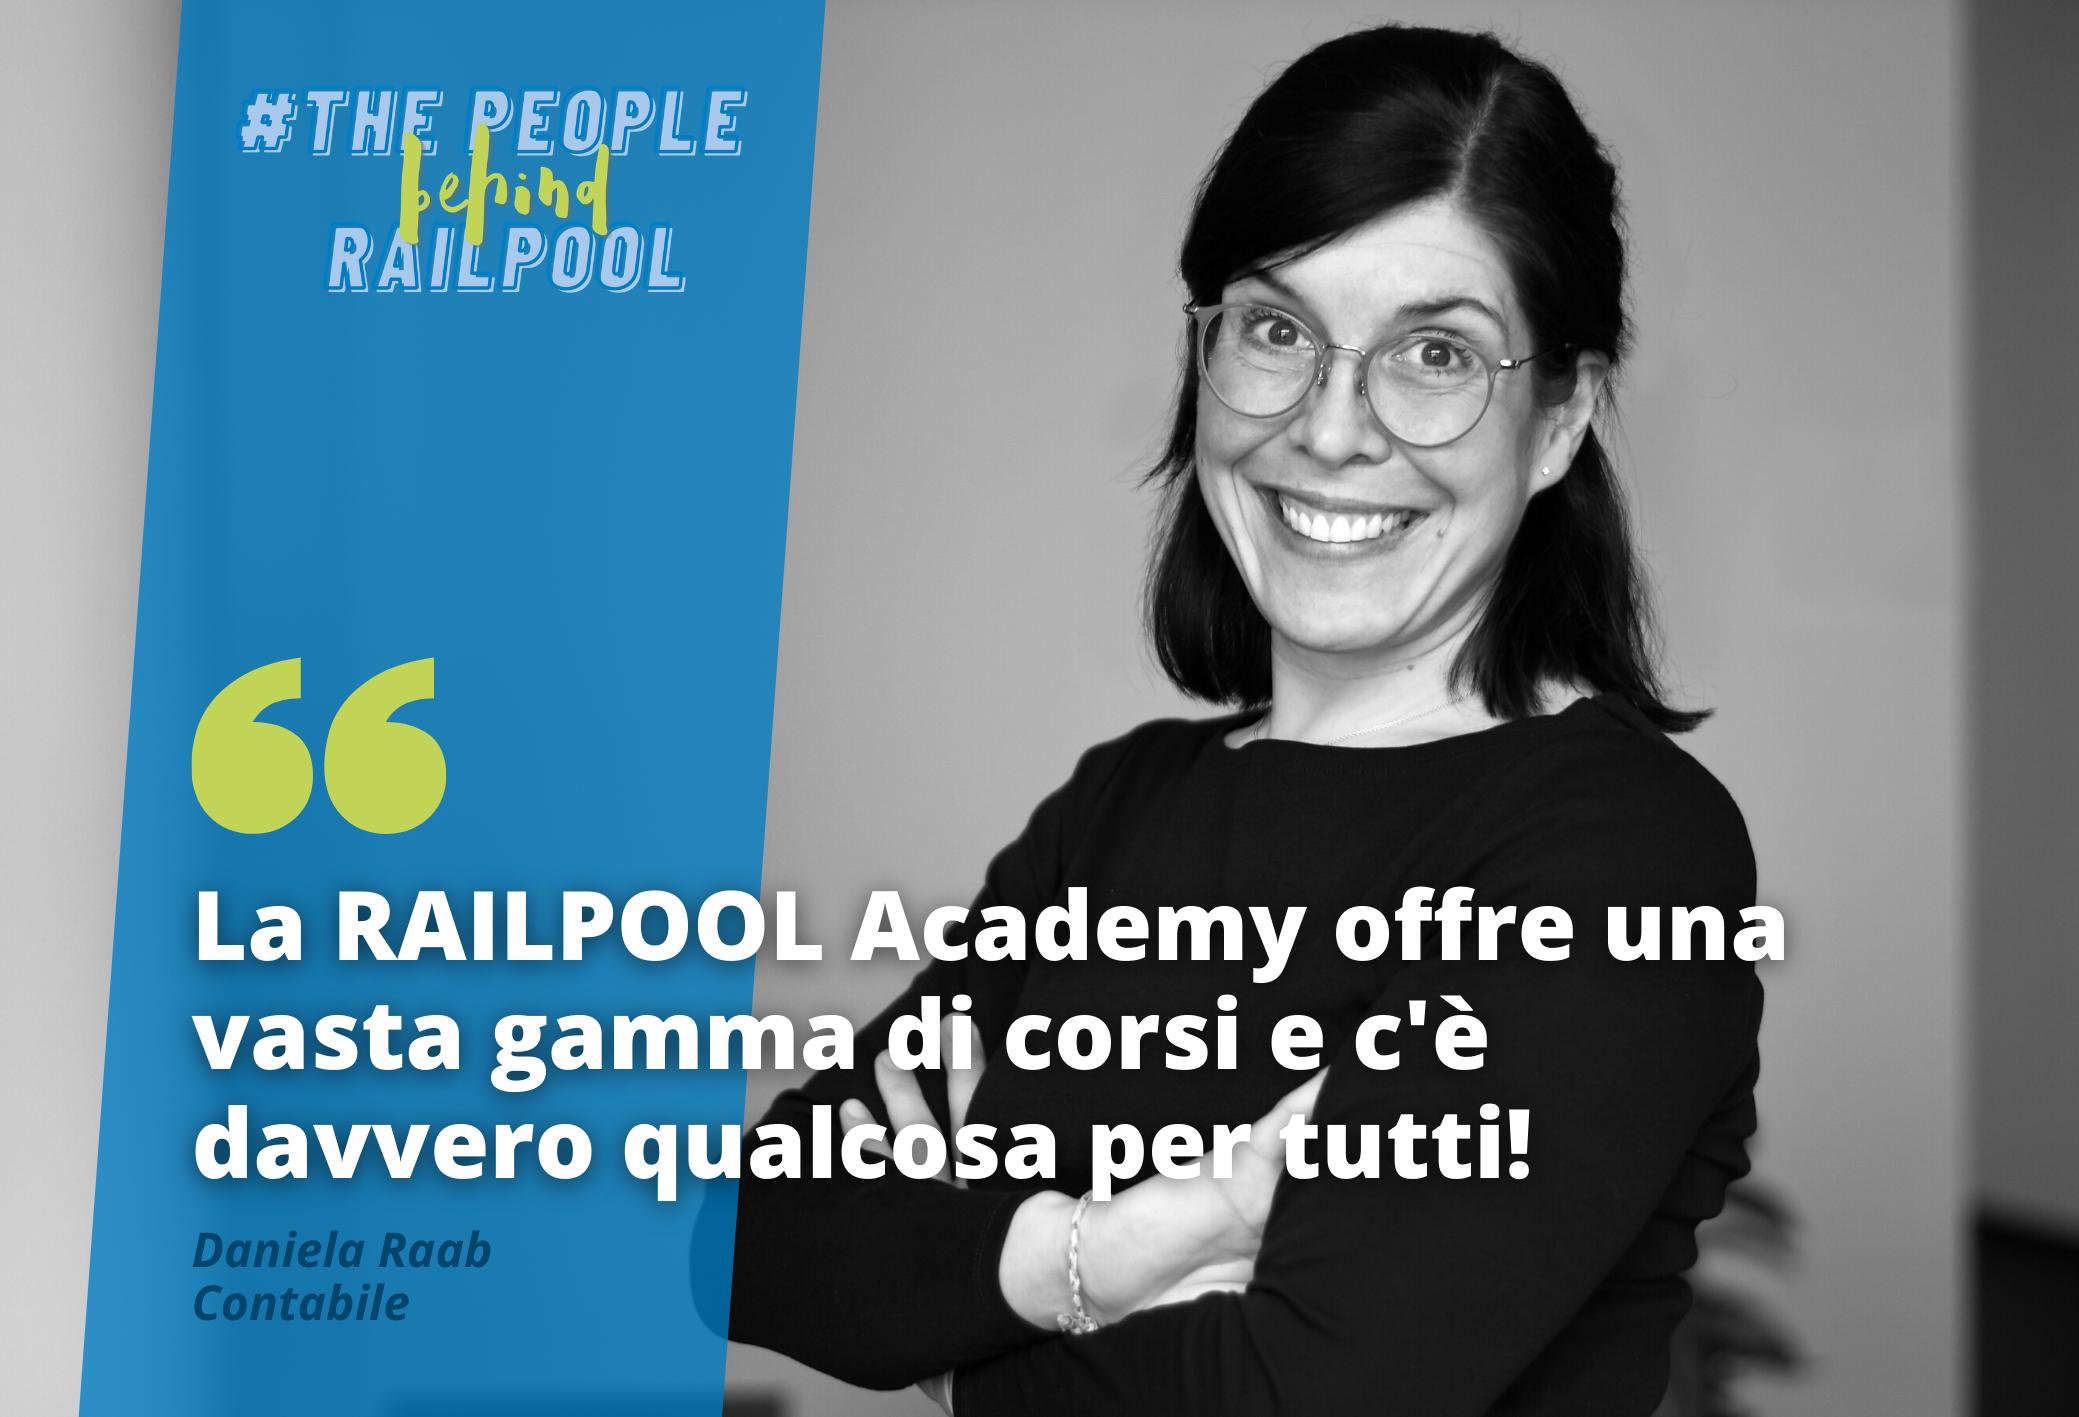 The people behind Railpool - Daniela Raab